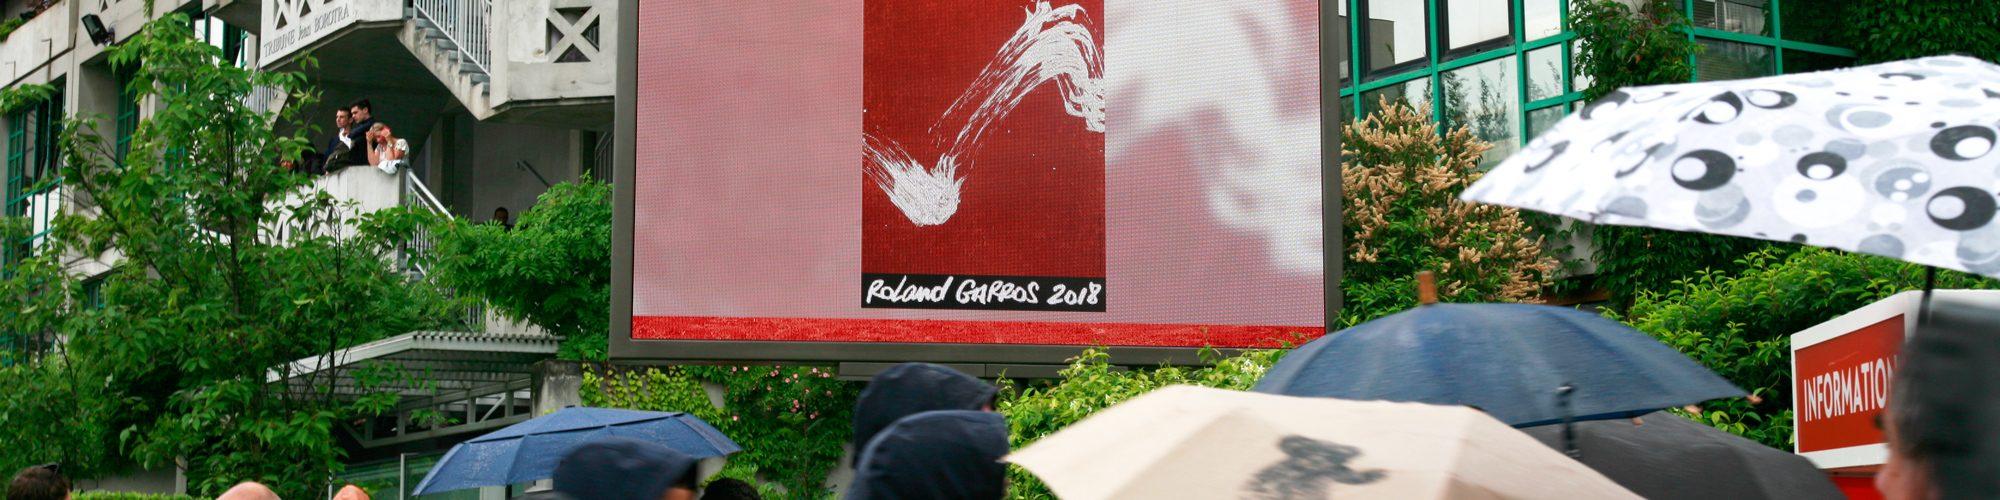 pantalla gigante LED M5.8 Supervision Roland Garros